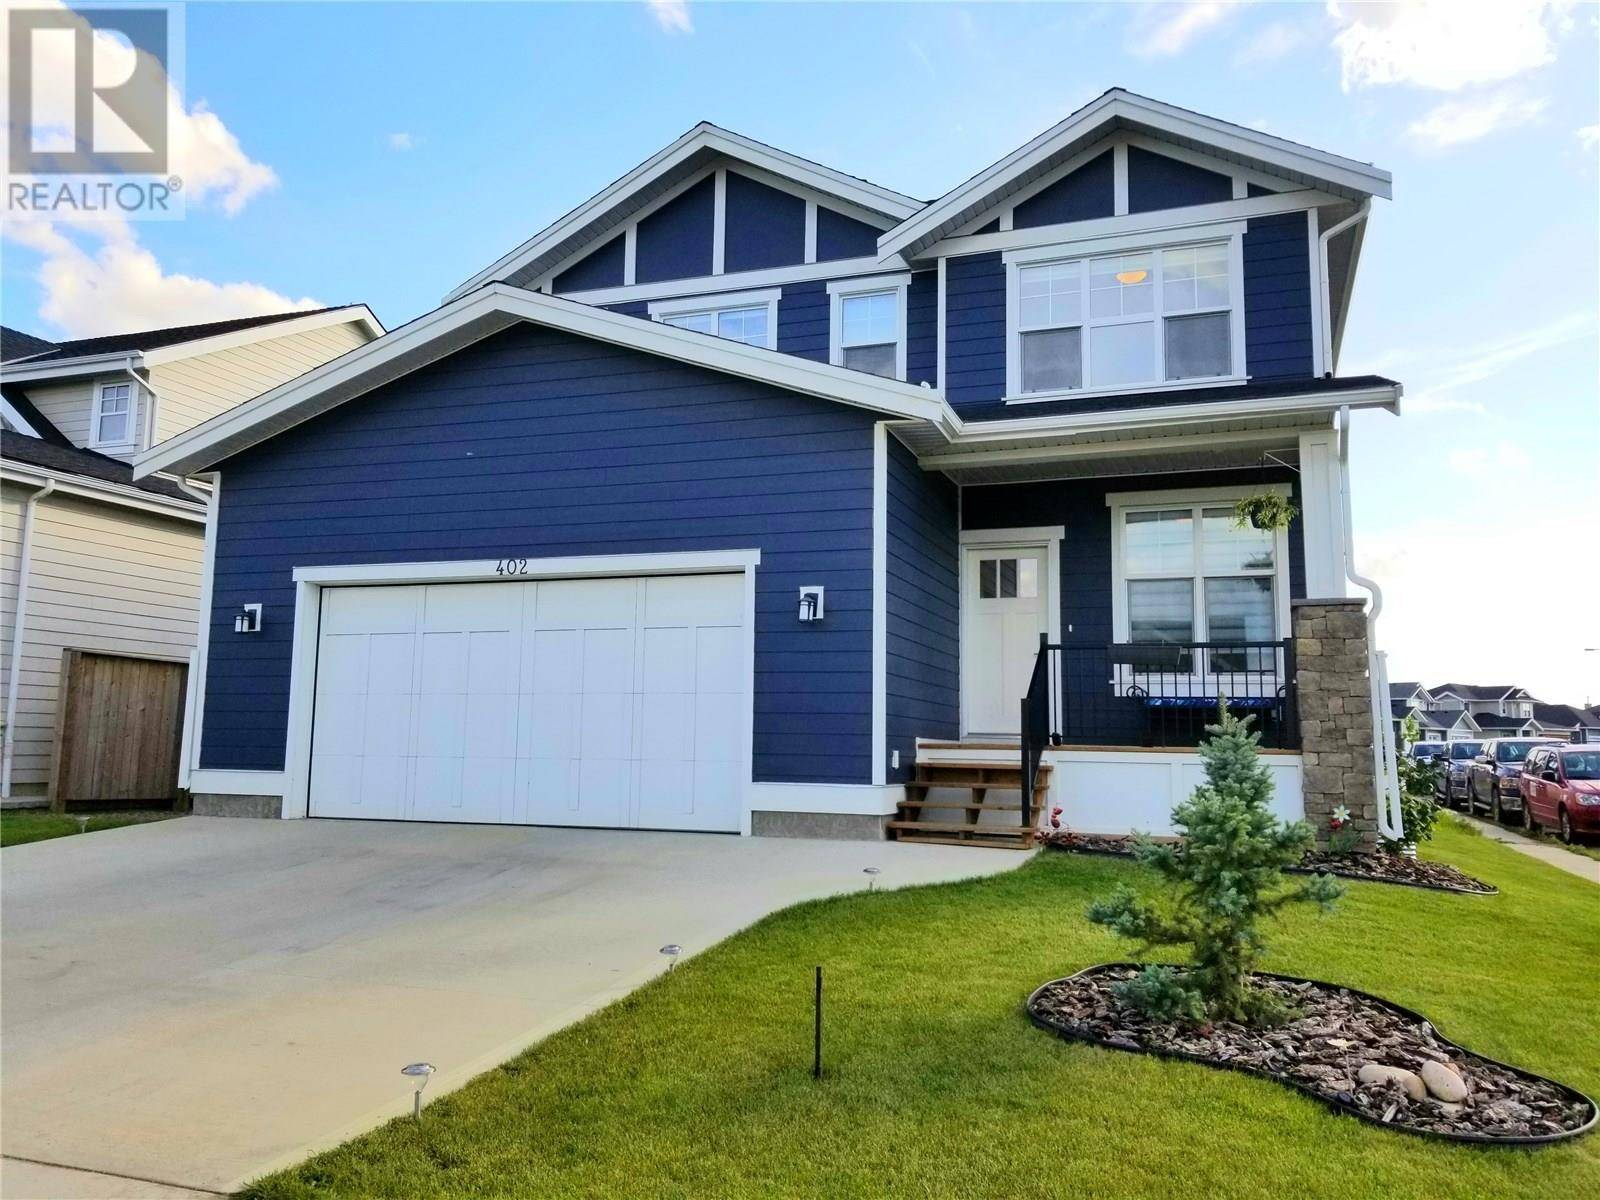 House for sale at 402 Meadows Blvd Saskatoon Saskatchewan - MLS: SK782775